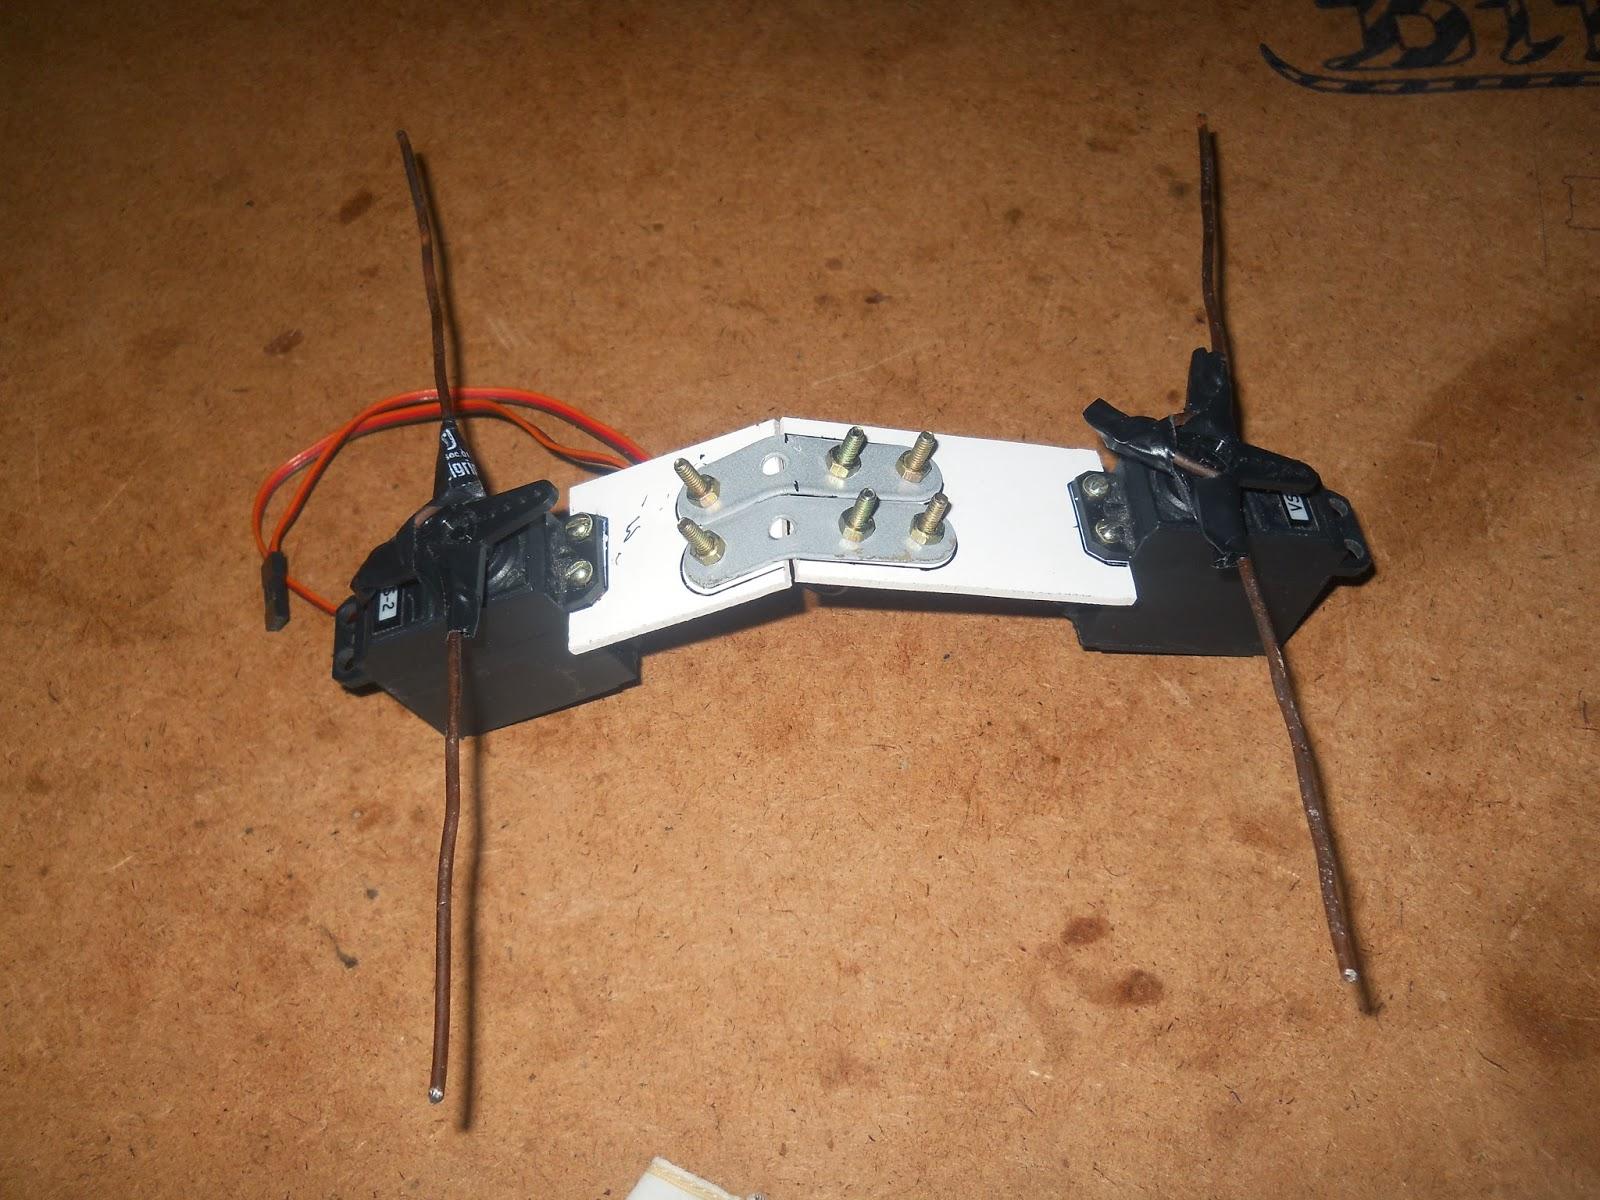 Robo zone arduino based quadruped robot using servos